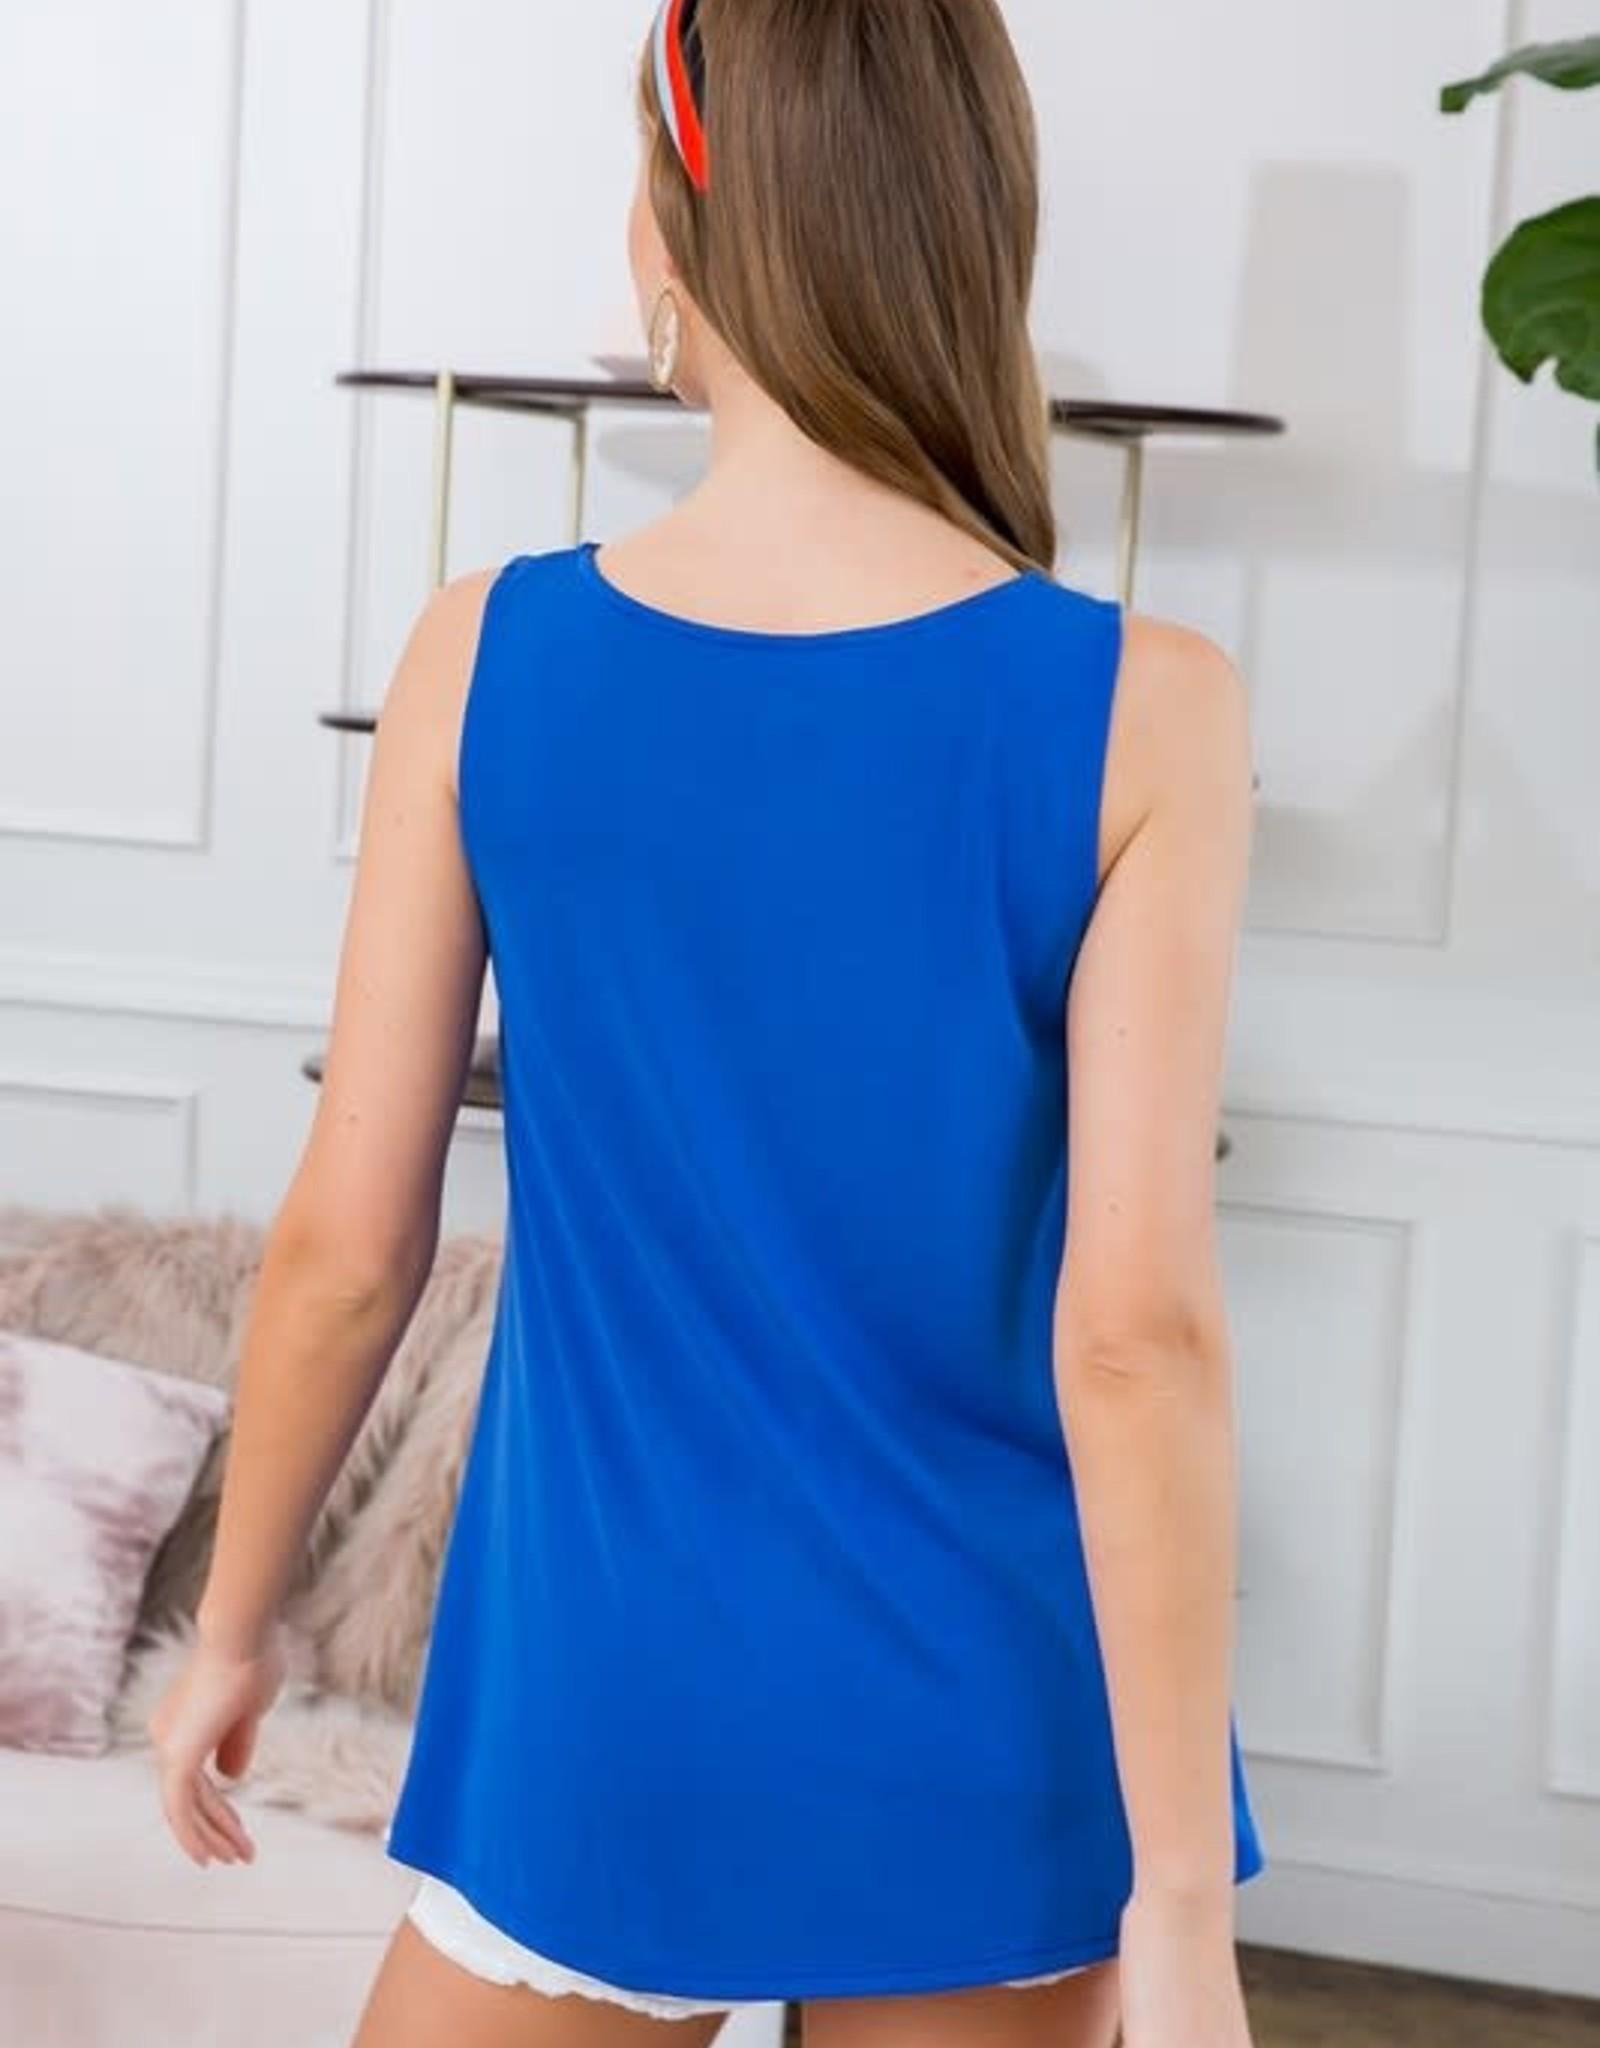 Ladies' Fashions Sleeveless Side Twist Tunic